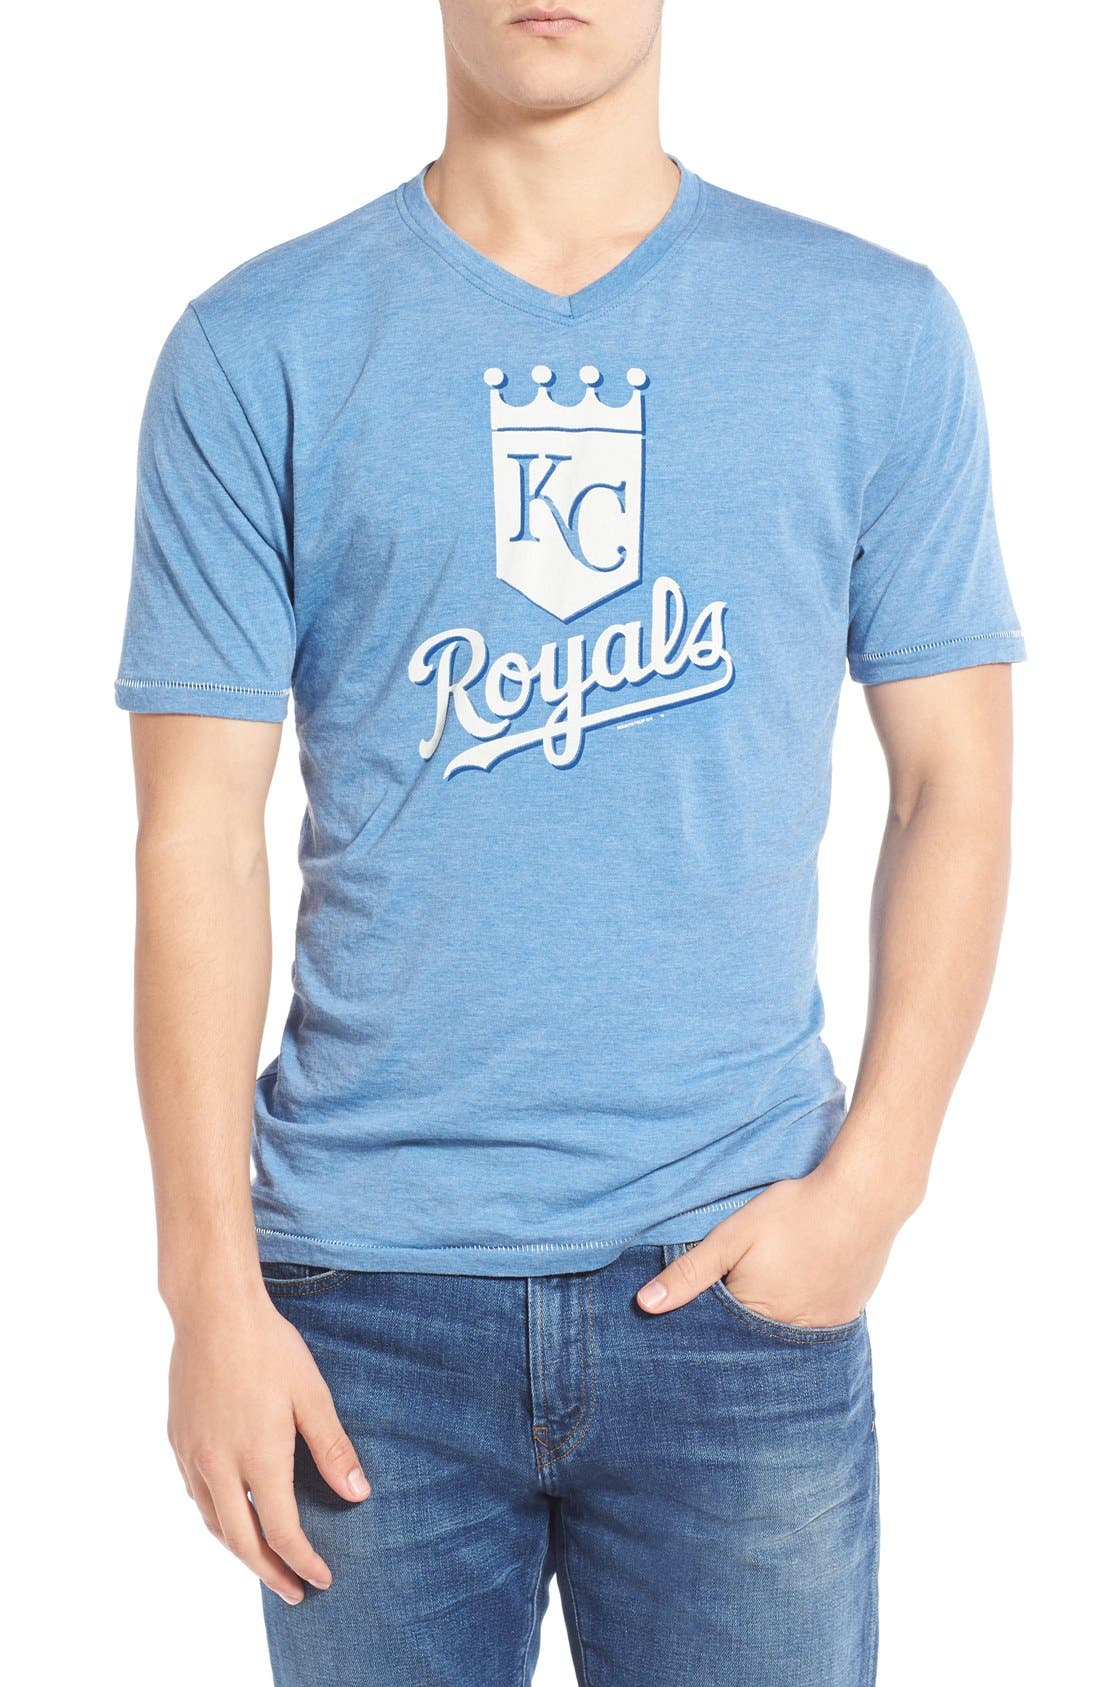 RED JACKET Kansas City Royals - Calumet Graphic V-Neck T-Shirt